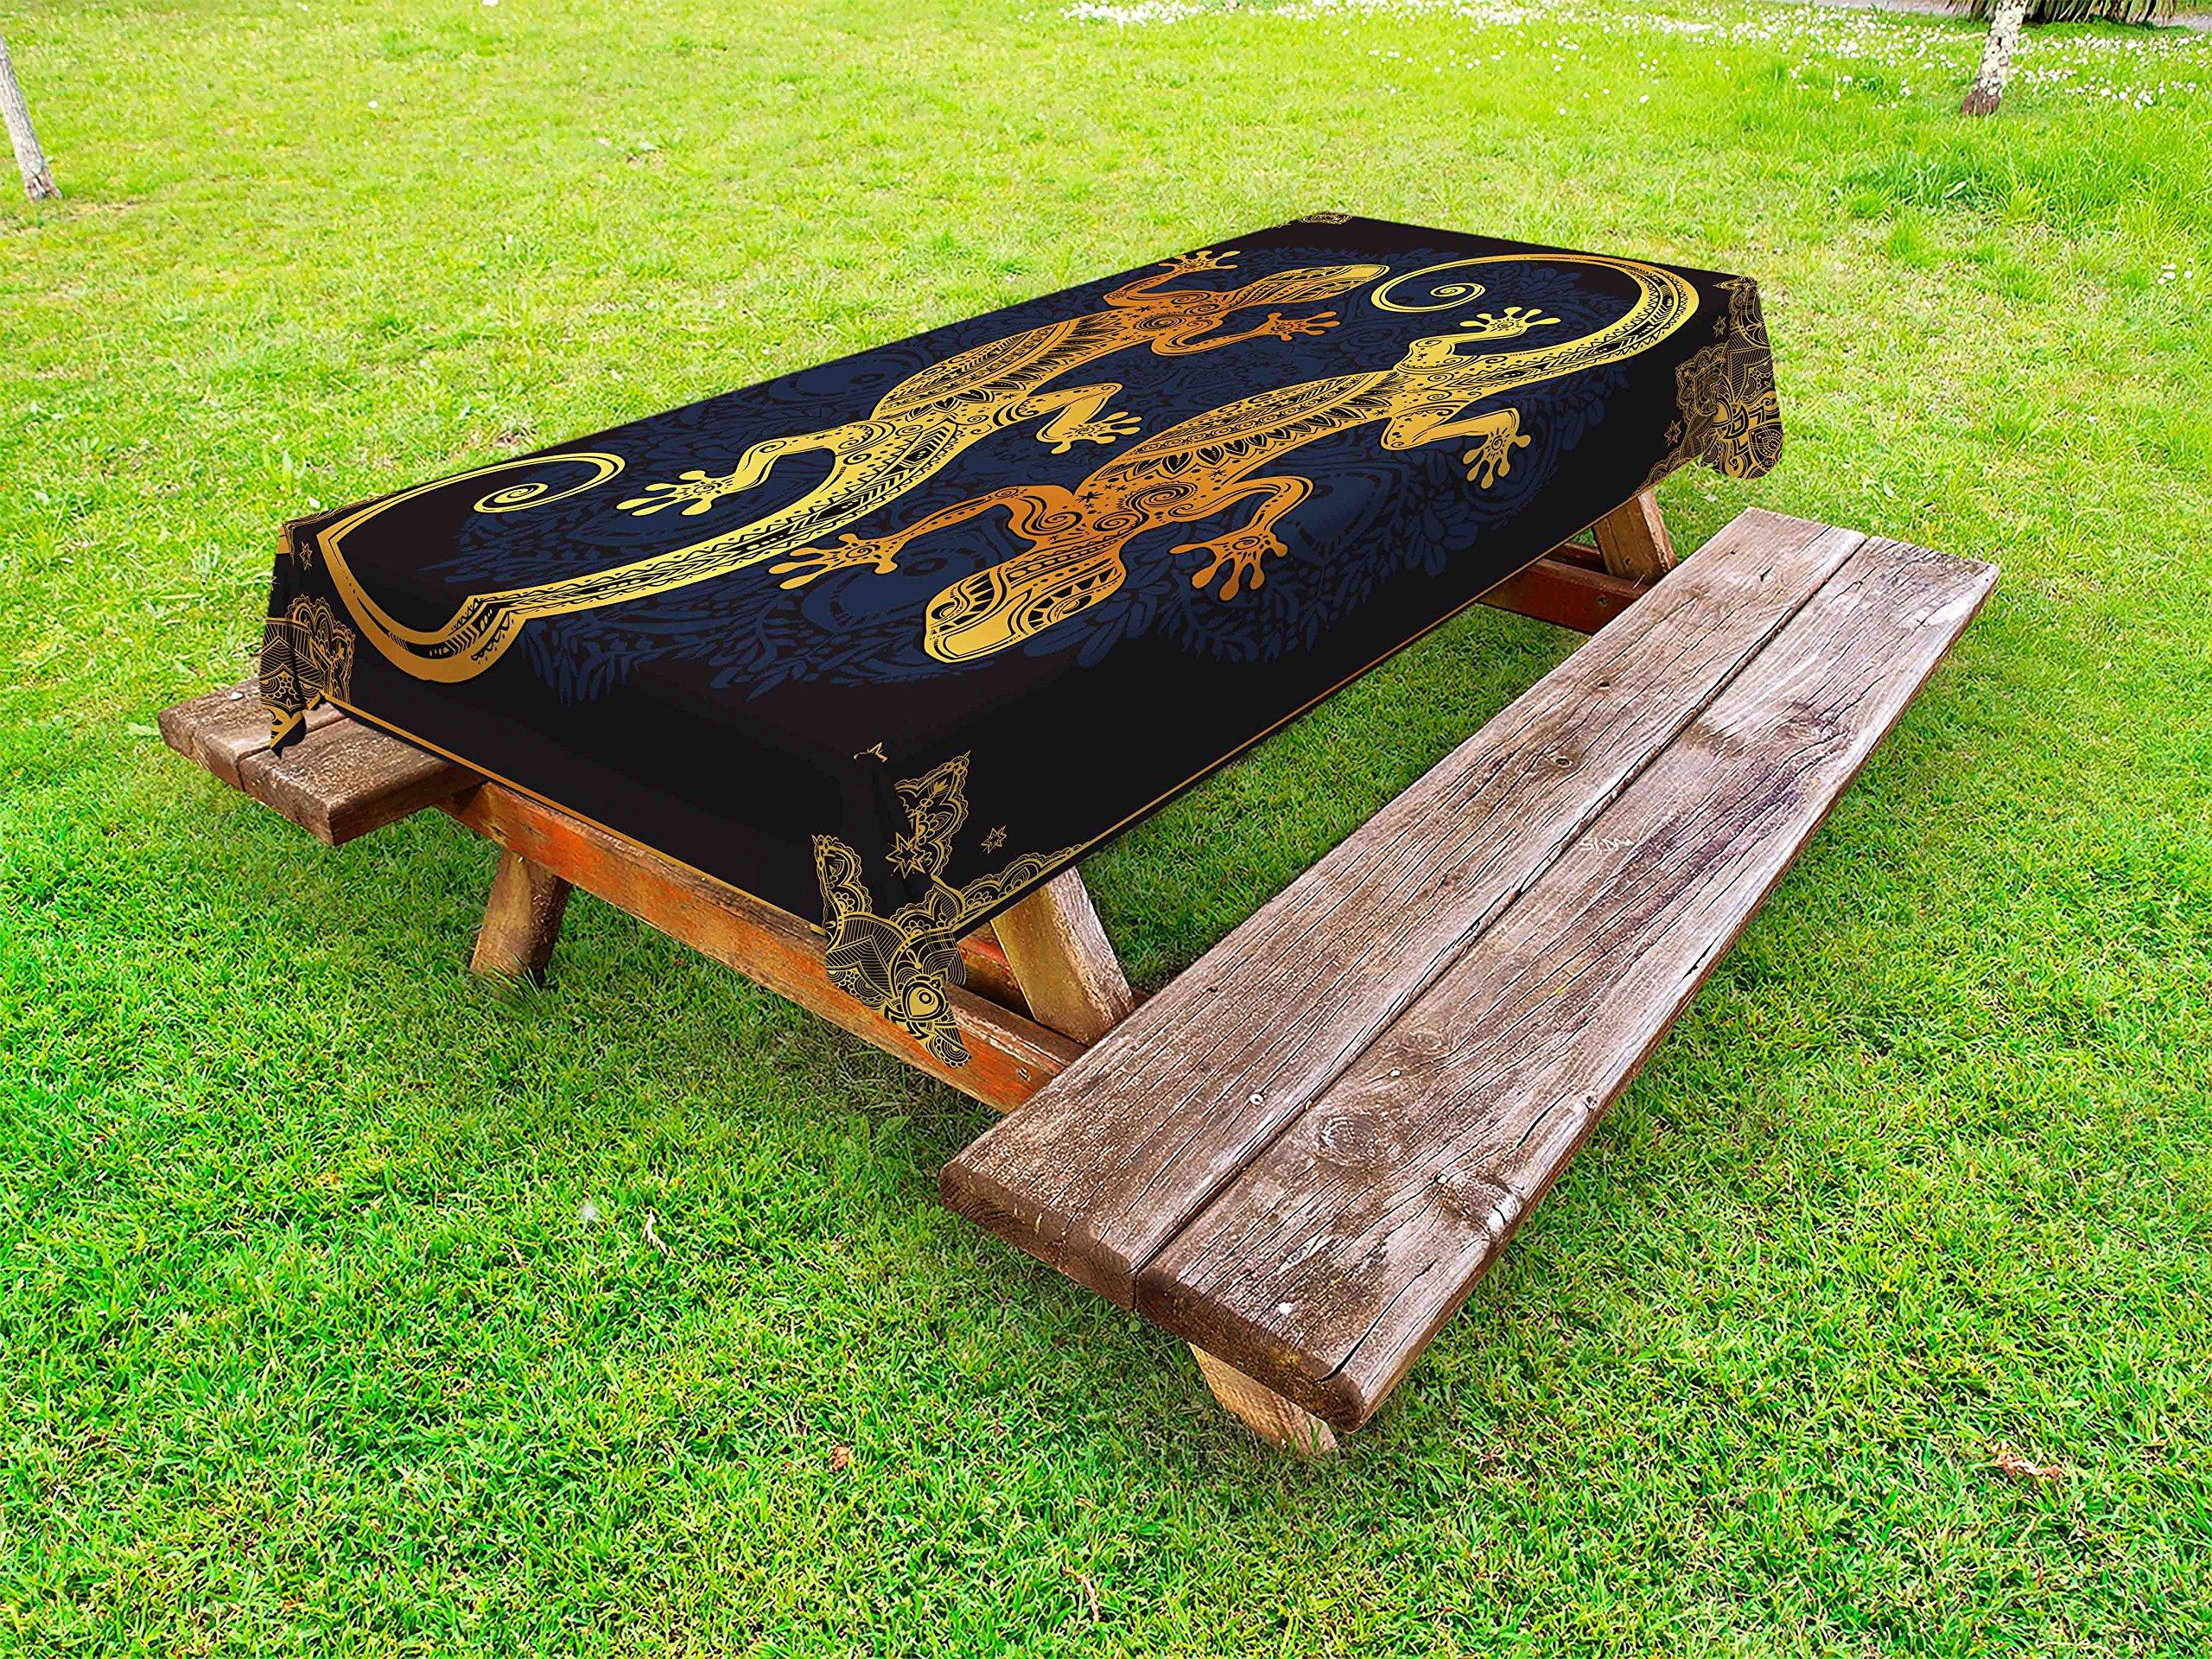 Lunarable Mandala Outdoor Tablecloth, Artistic Gecko Lizards Boho Framework Tropical Henna Tattoo Style, Decorative Washable Picnic Table Cloth, 58 X 120 inches, Dark Orange Yellow Dark Blue